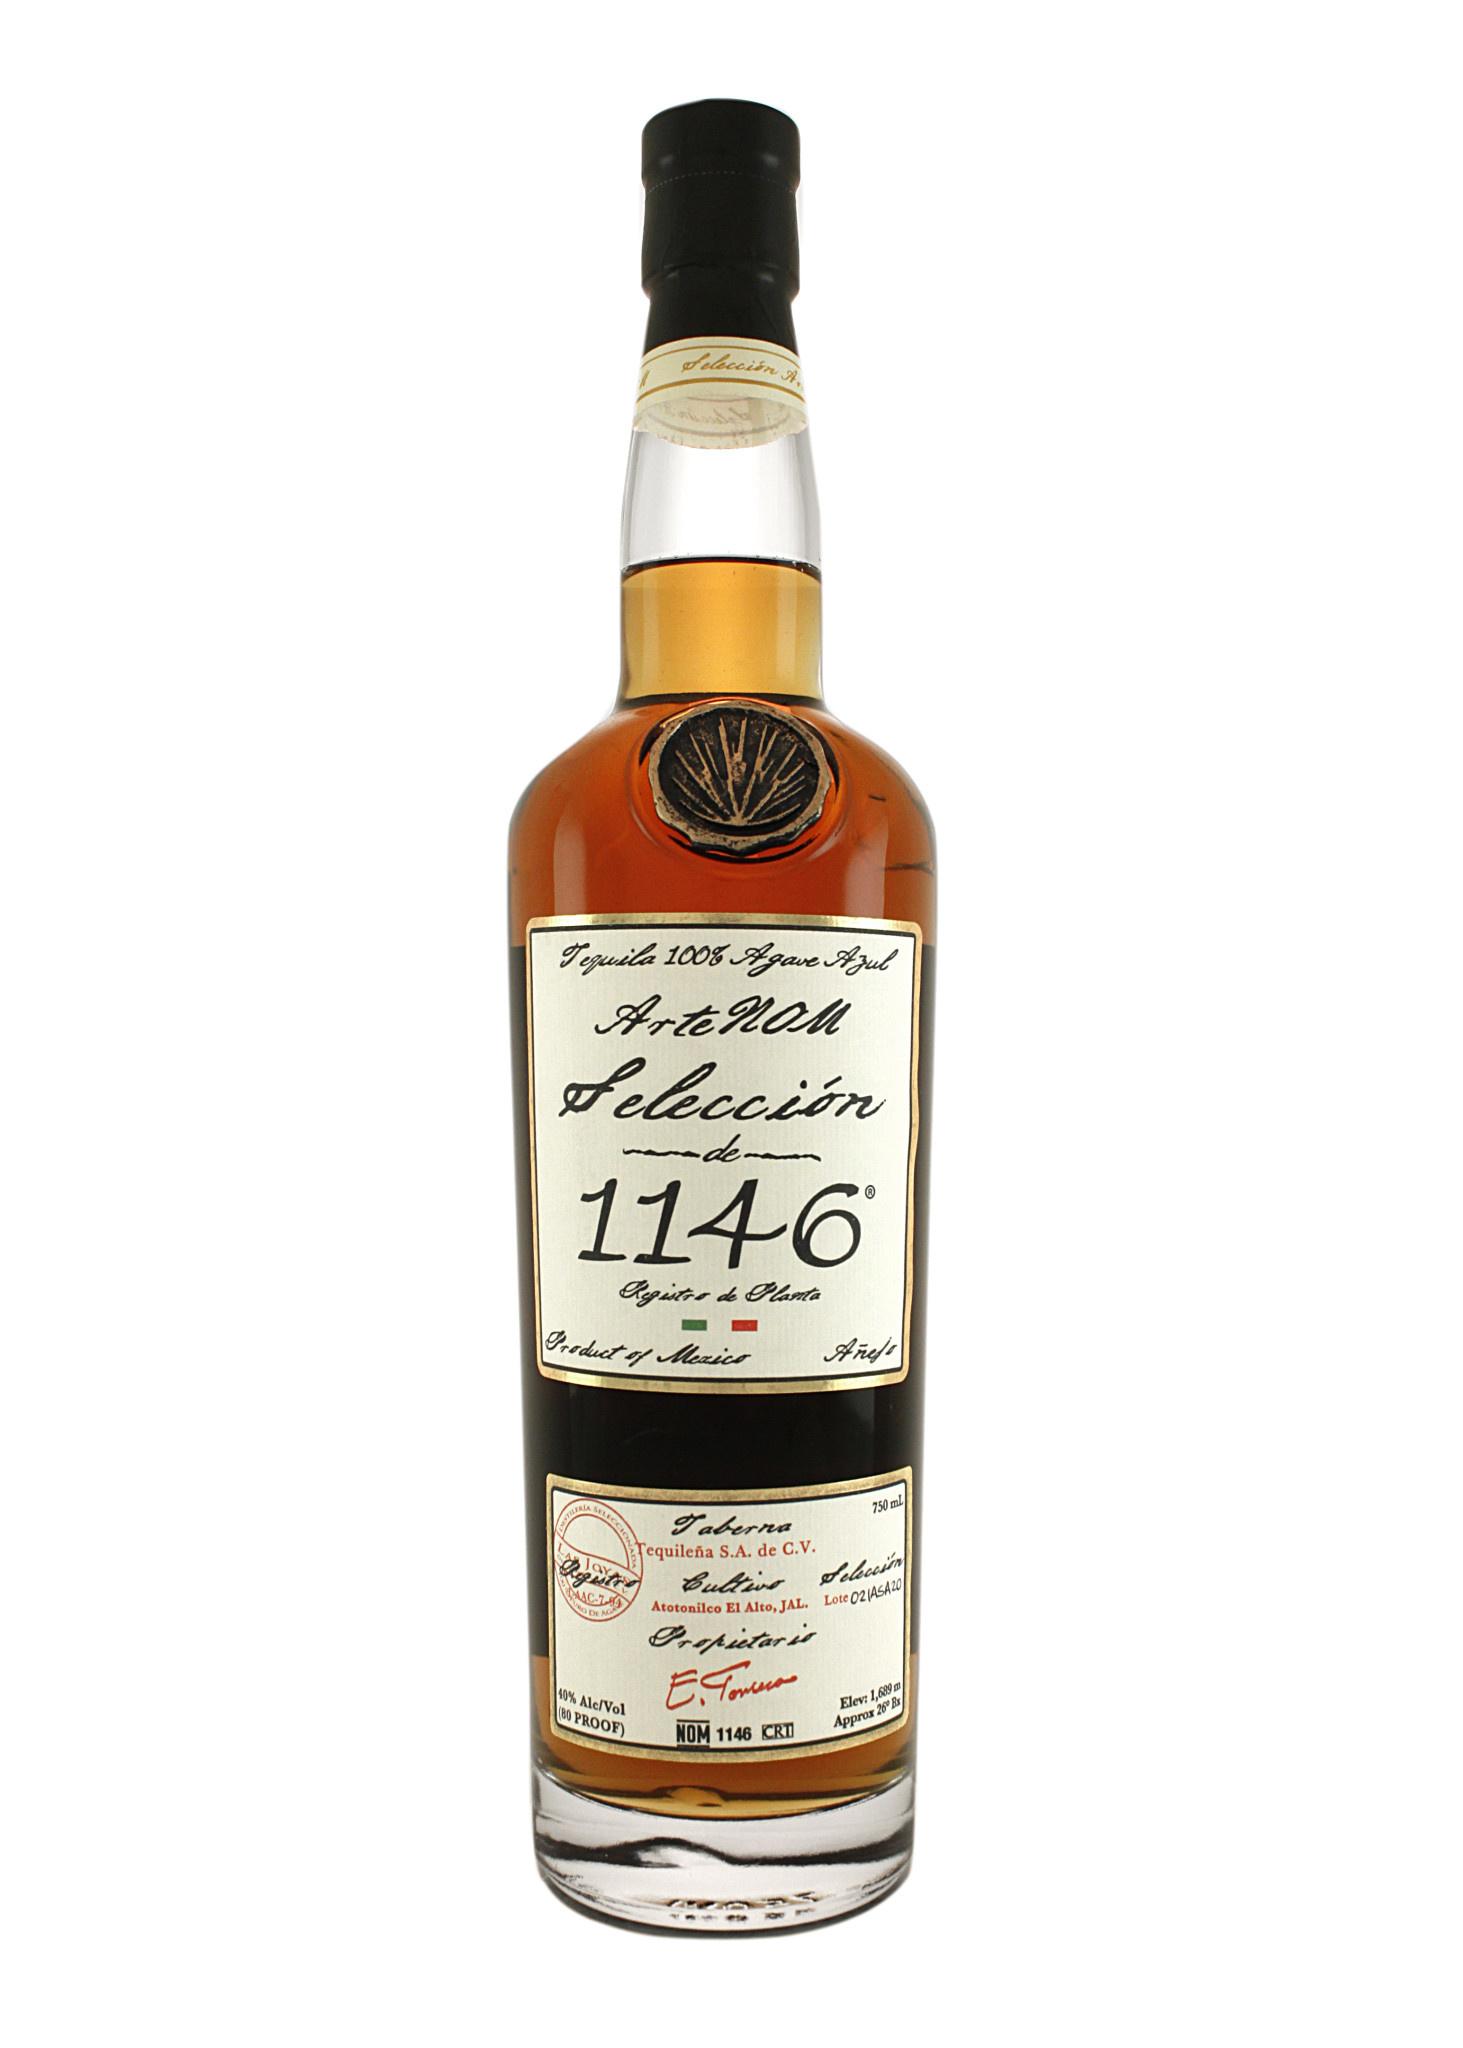 ArteNOM Seleccion 1146 Tequila Anejo